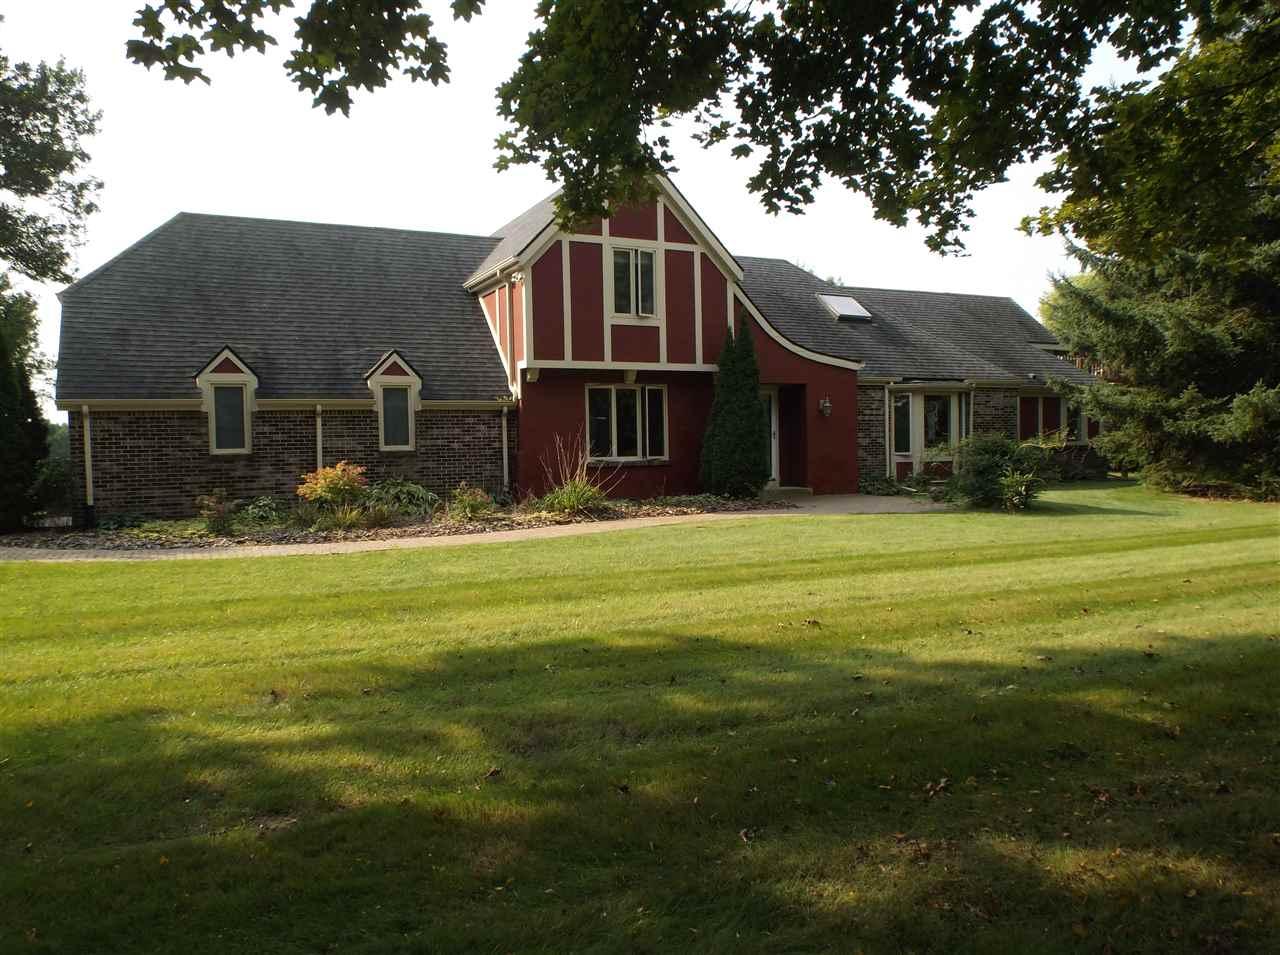 3757 Meadowbrooke Cir, Windsor, WI 53532